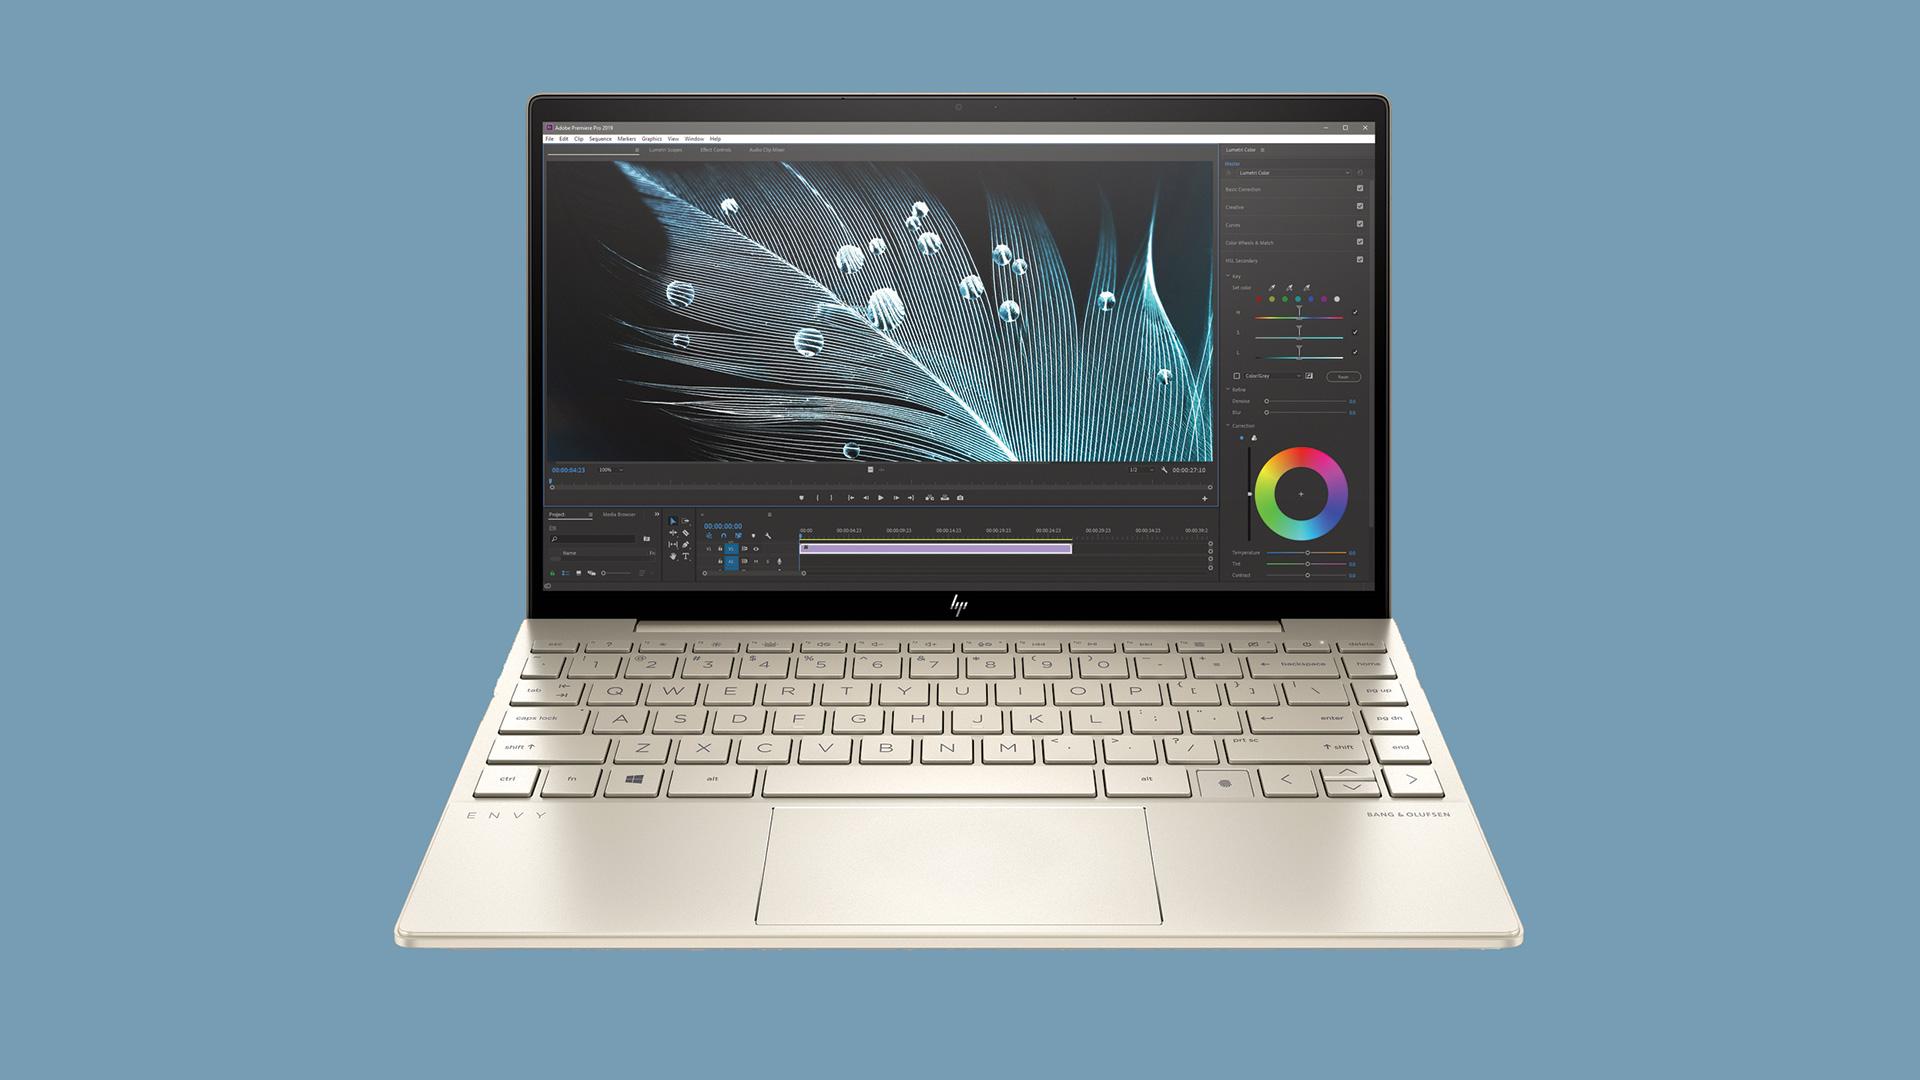 HP Envy x360: best mid-range laptop